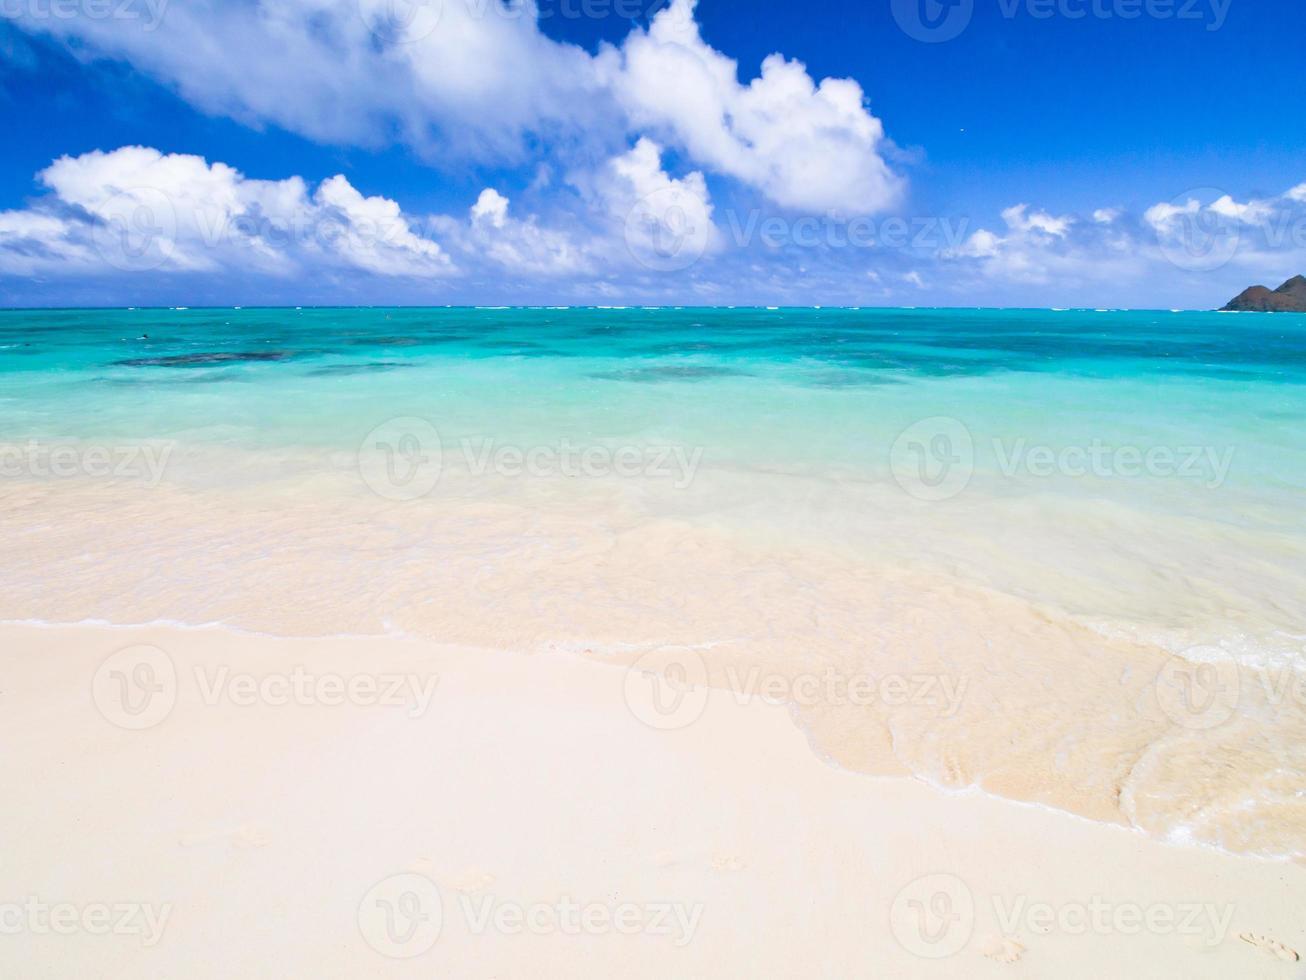 våg av lanikai stranden foto